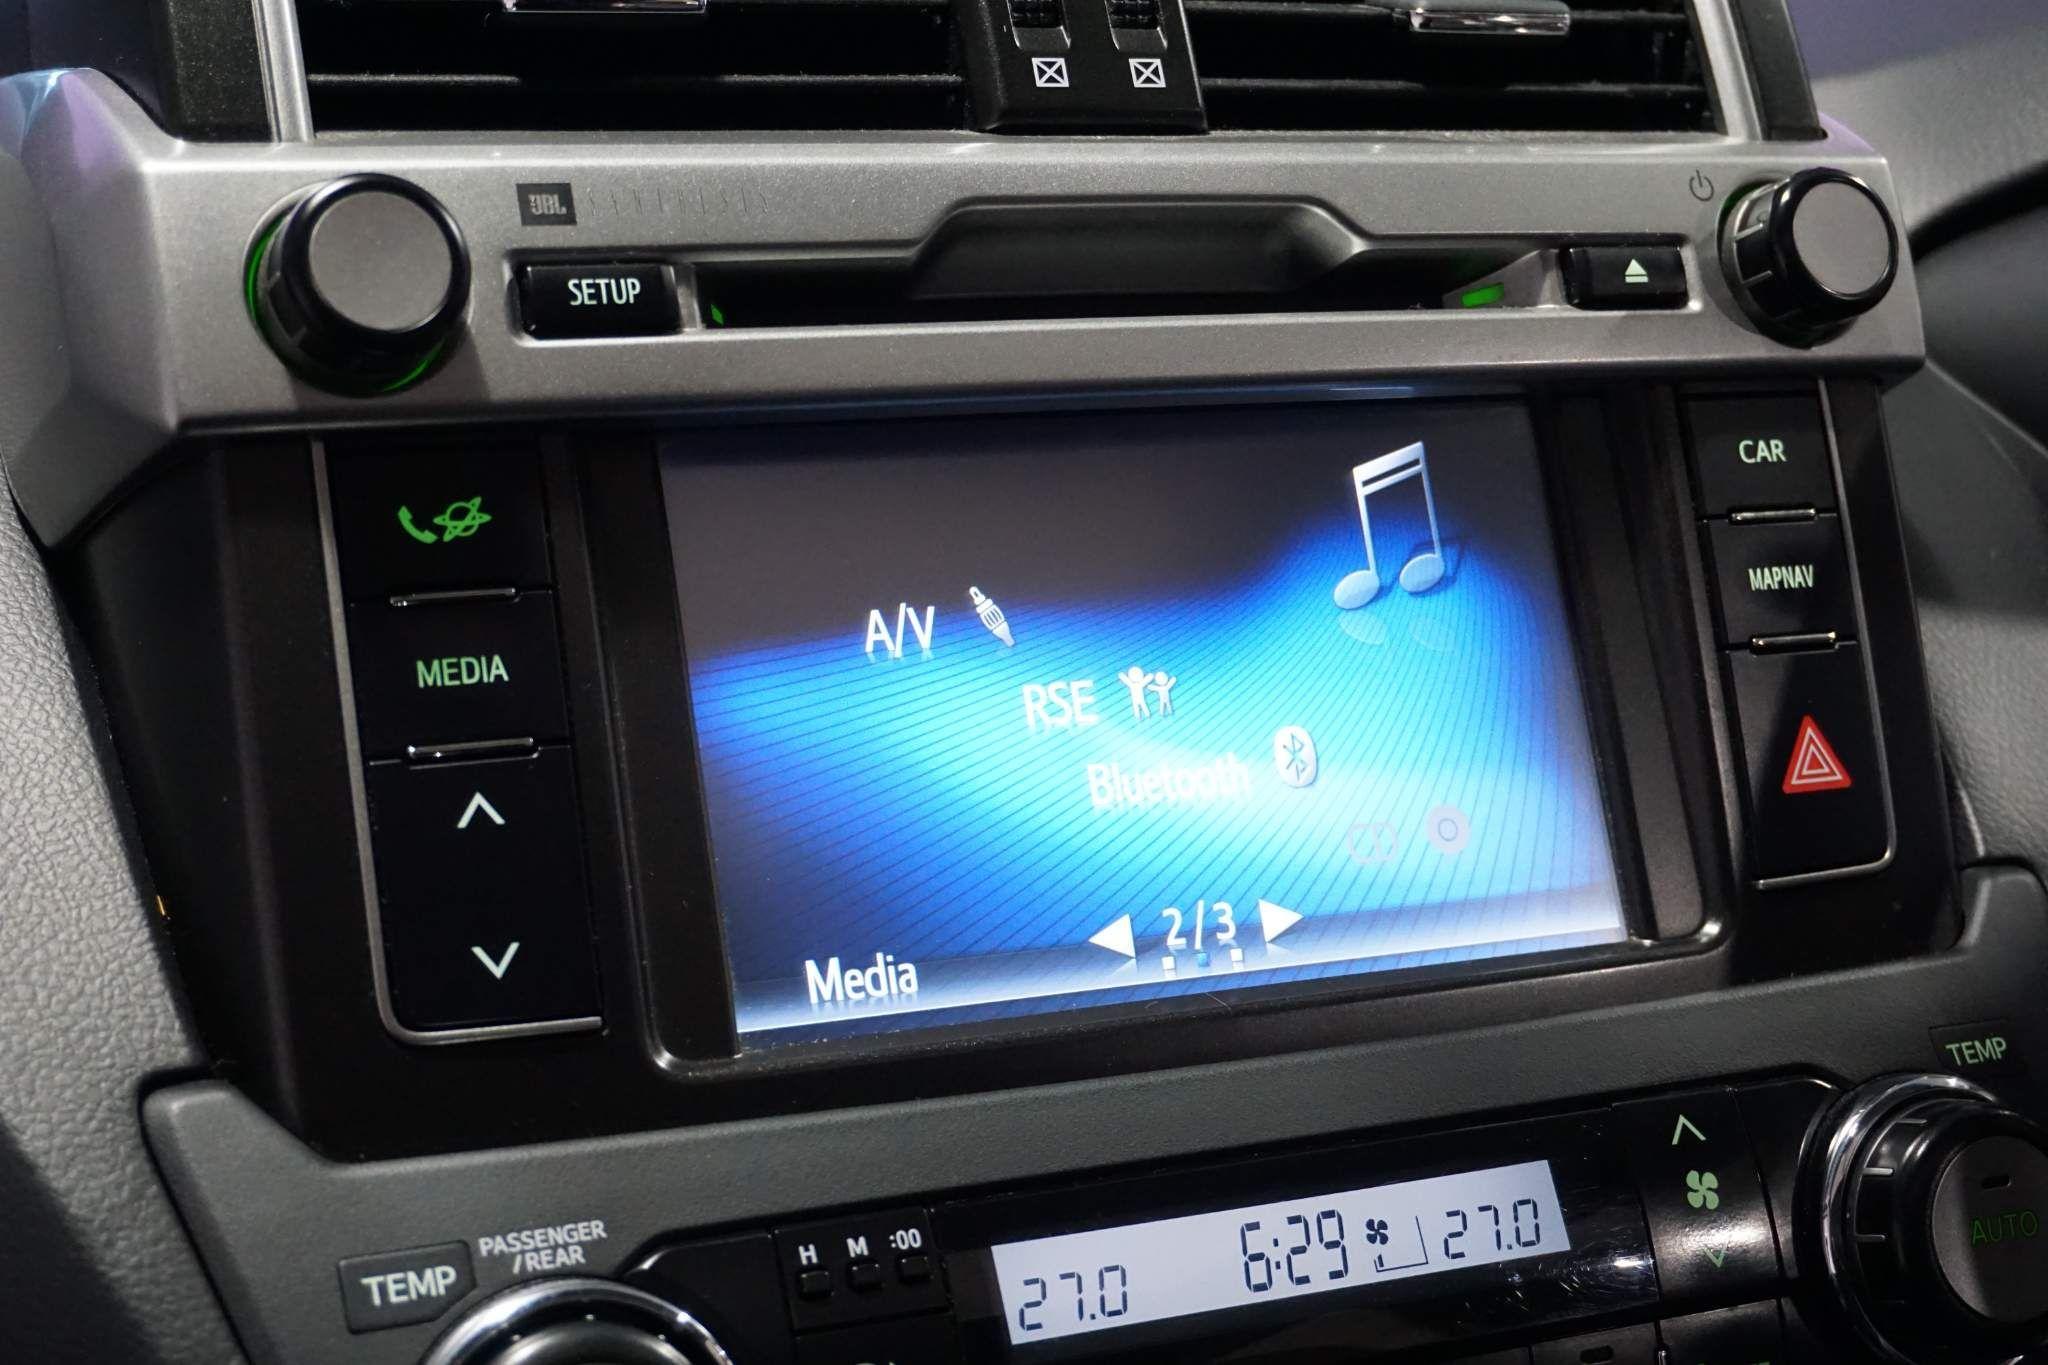 Toyota Land Cruiser 3.0 D-4D Invincible 5dr (7 Seats)